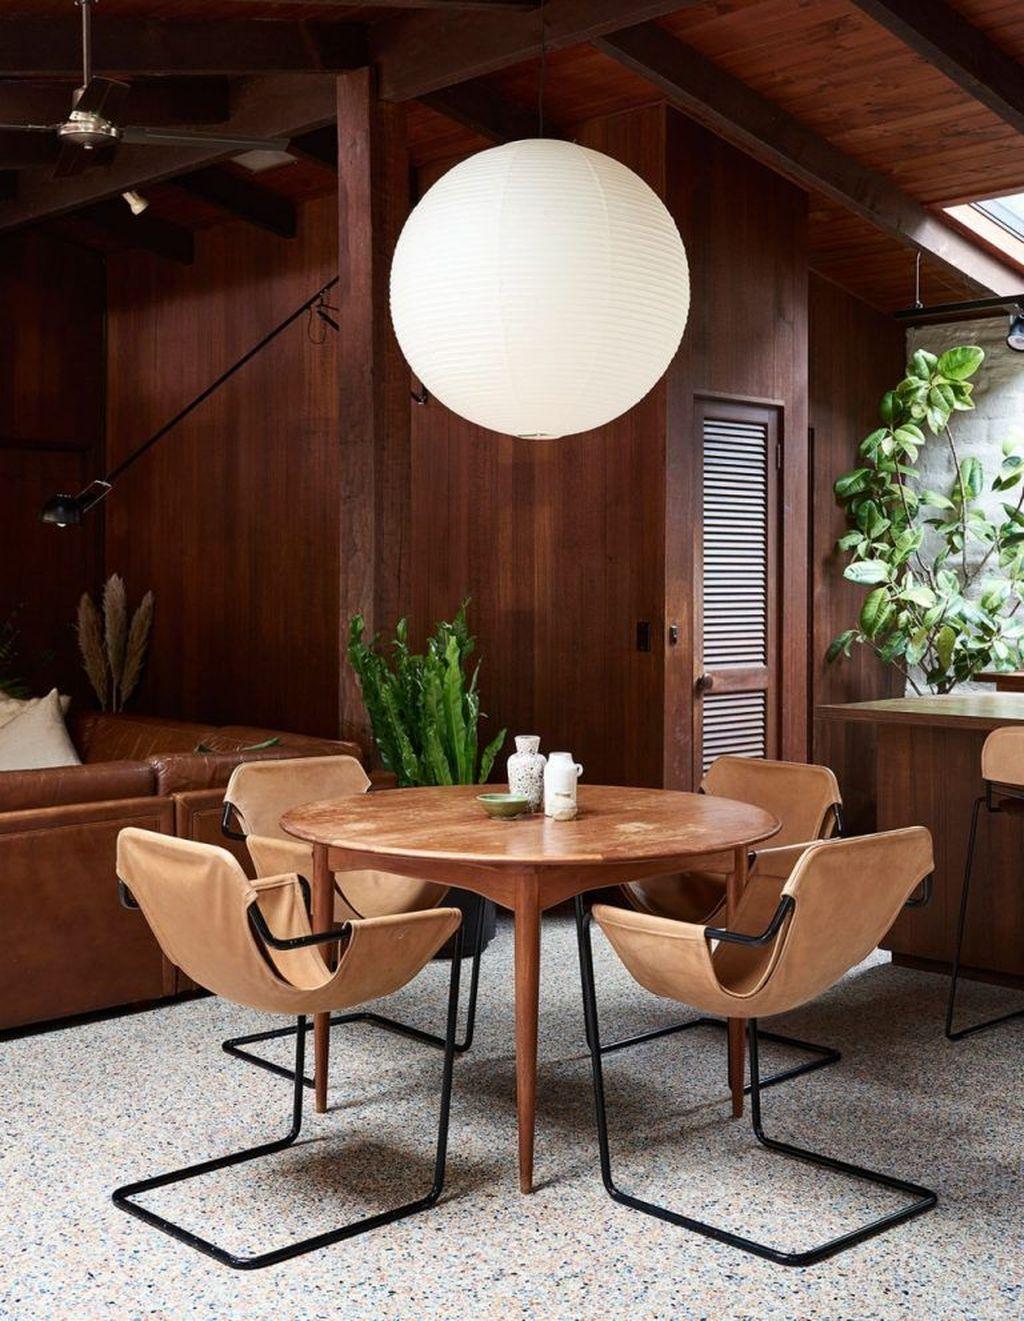 Inspiring Modern Home Furnishings Design Ideas 01